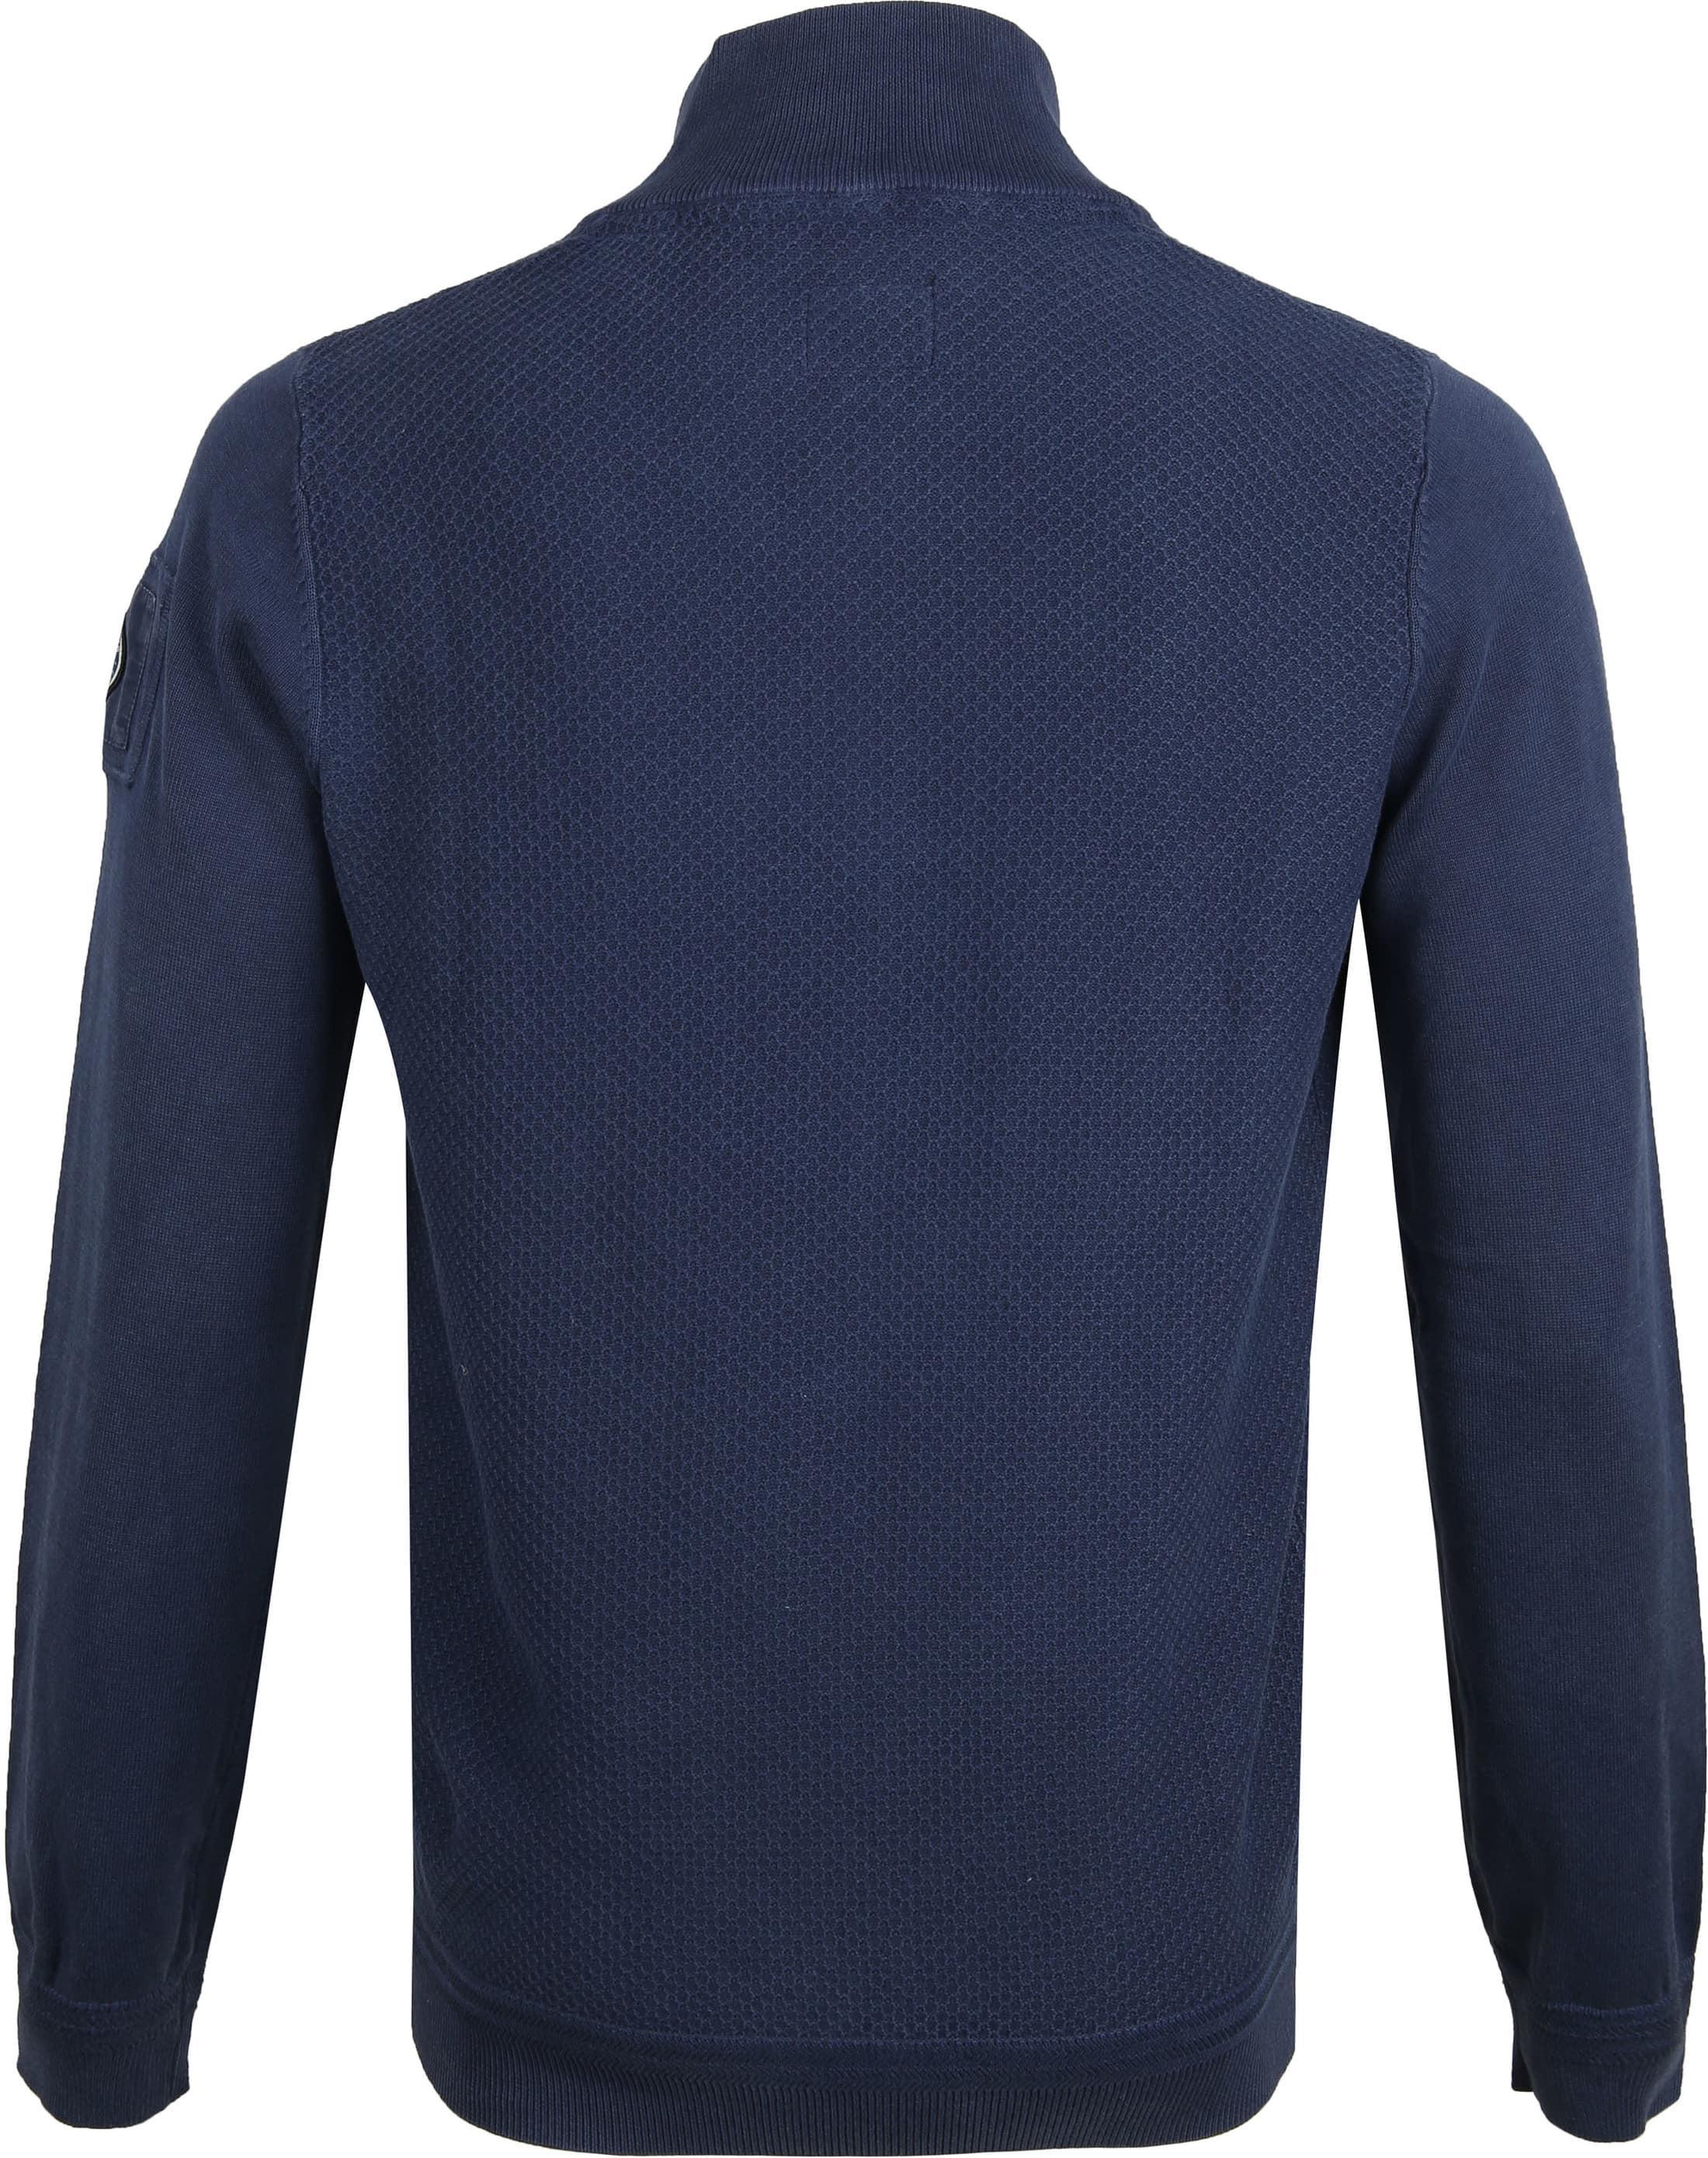 NZA Waihara Zipper Pullover Navy foto 3